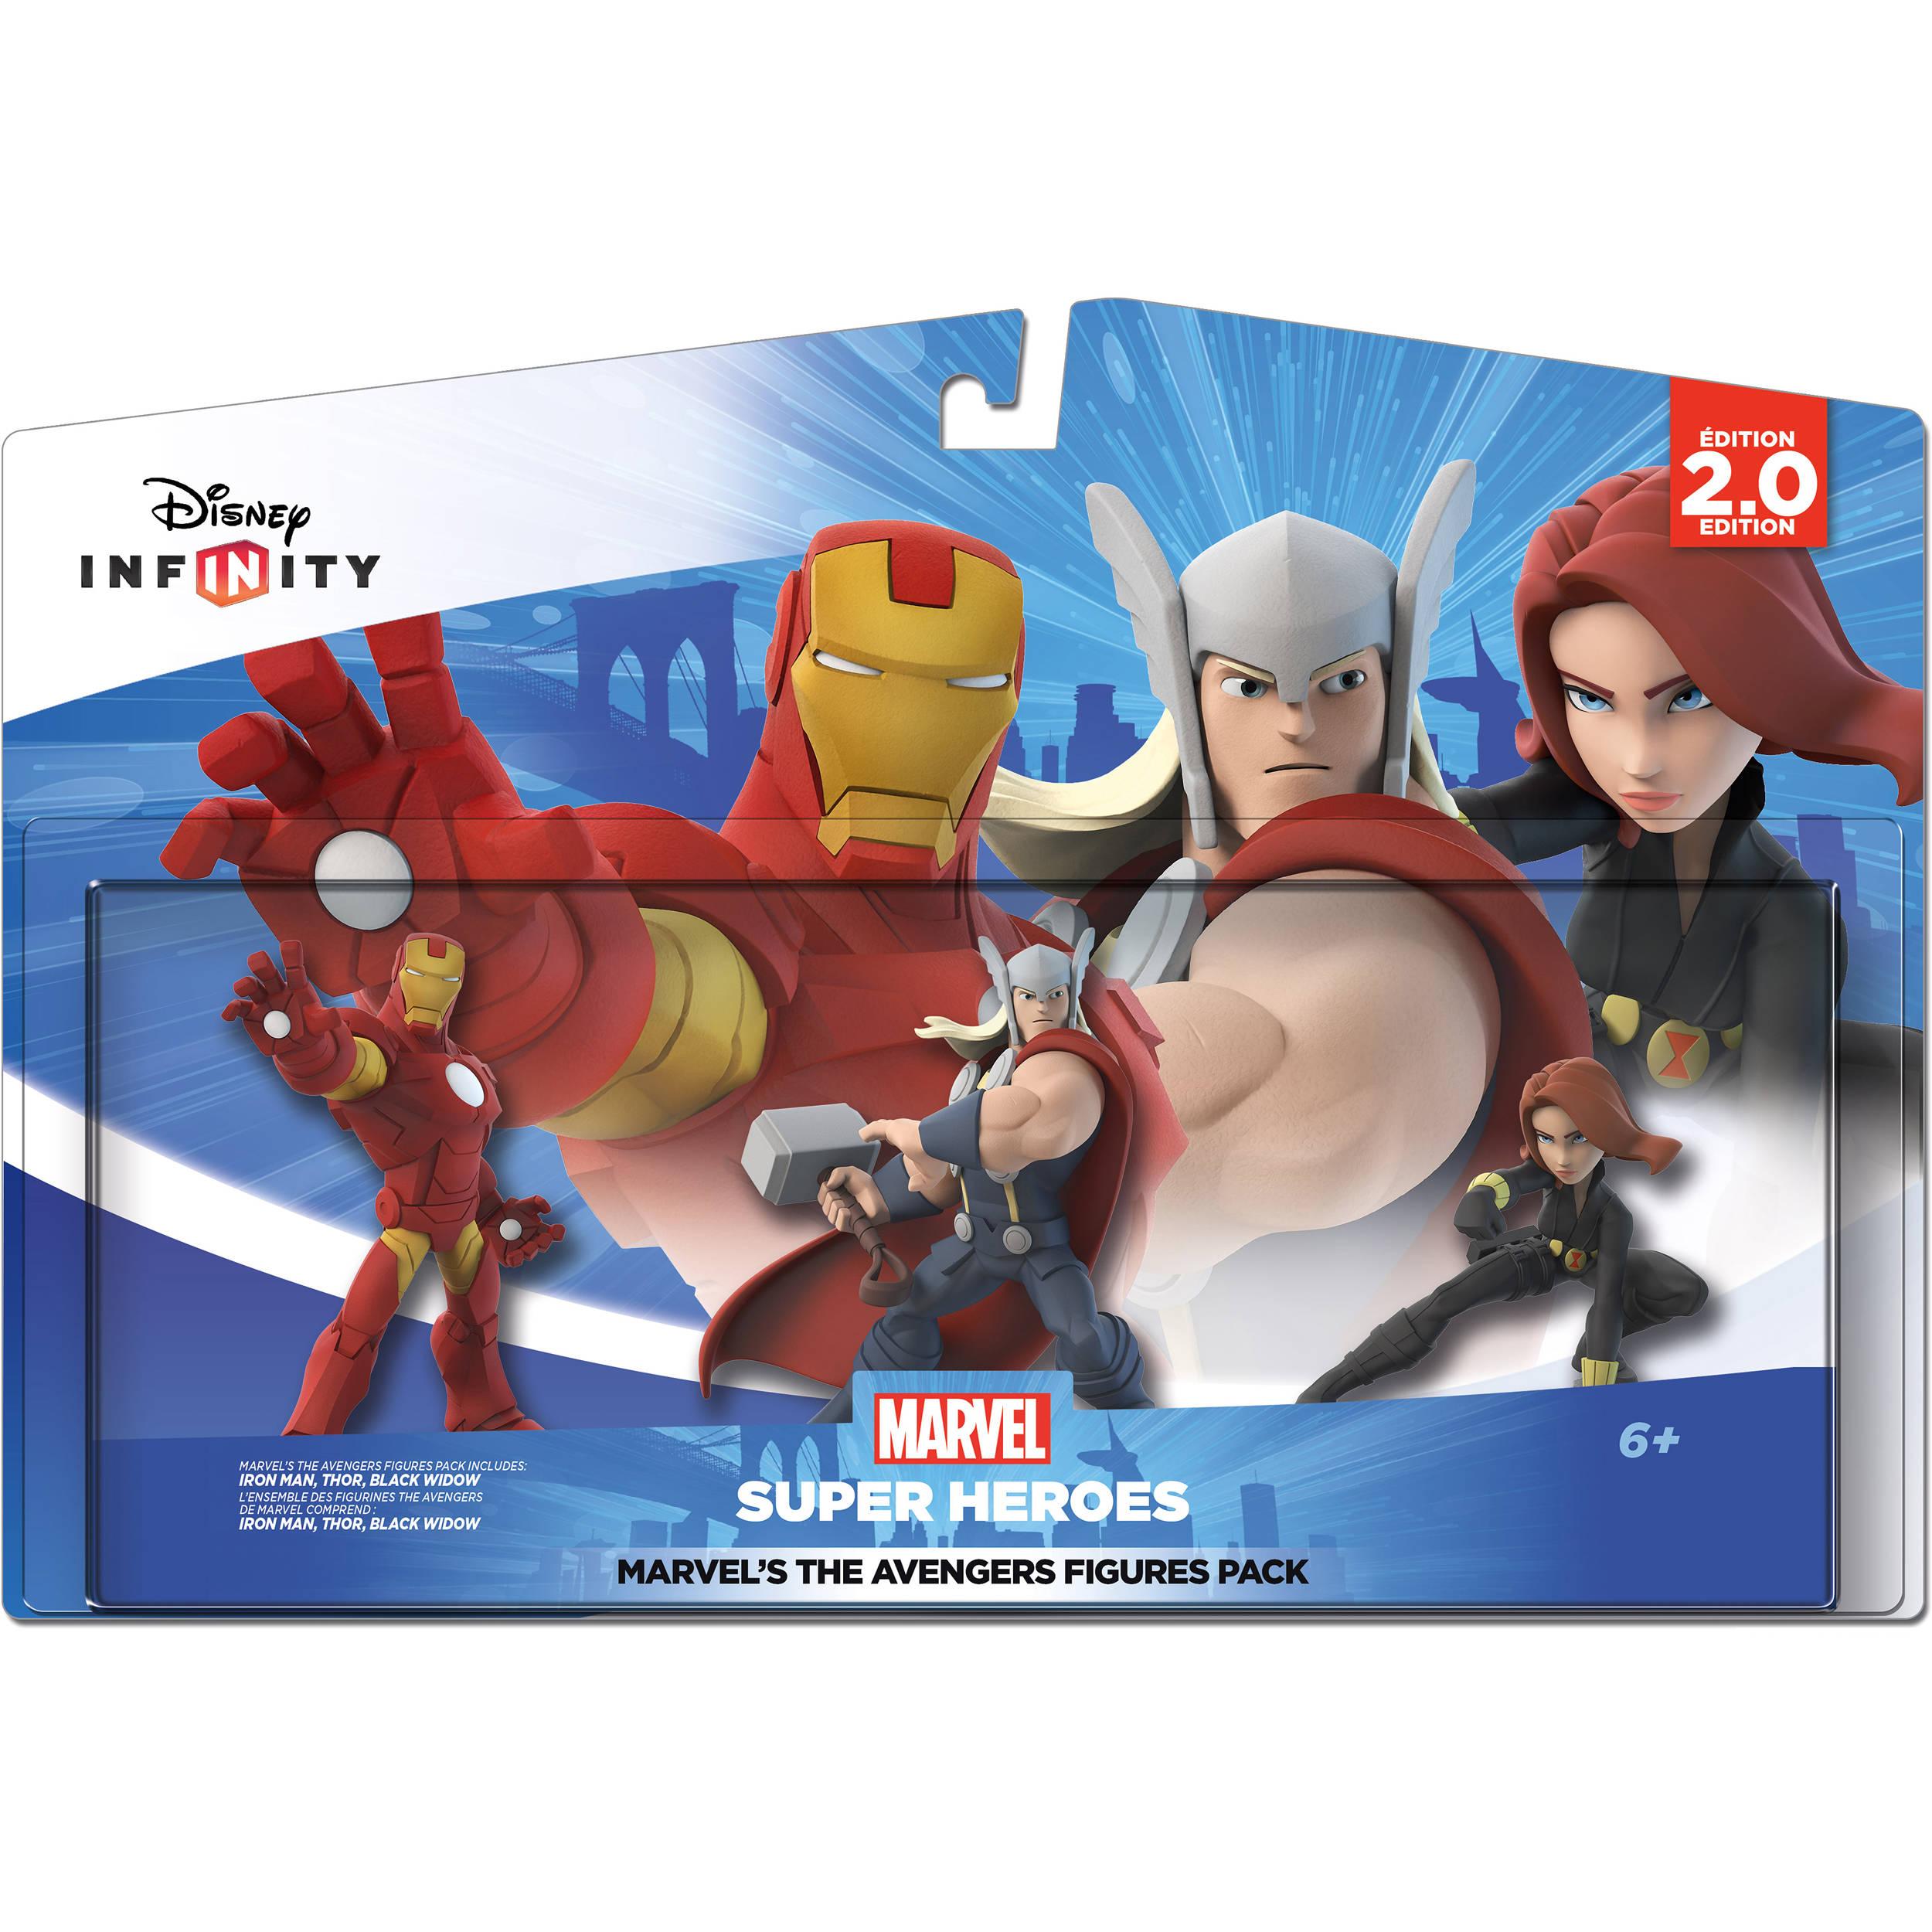 Disney Infinity 2.0 3.0 Disney Marvel Avengers